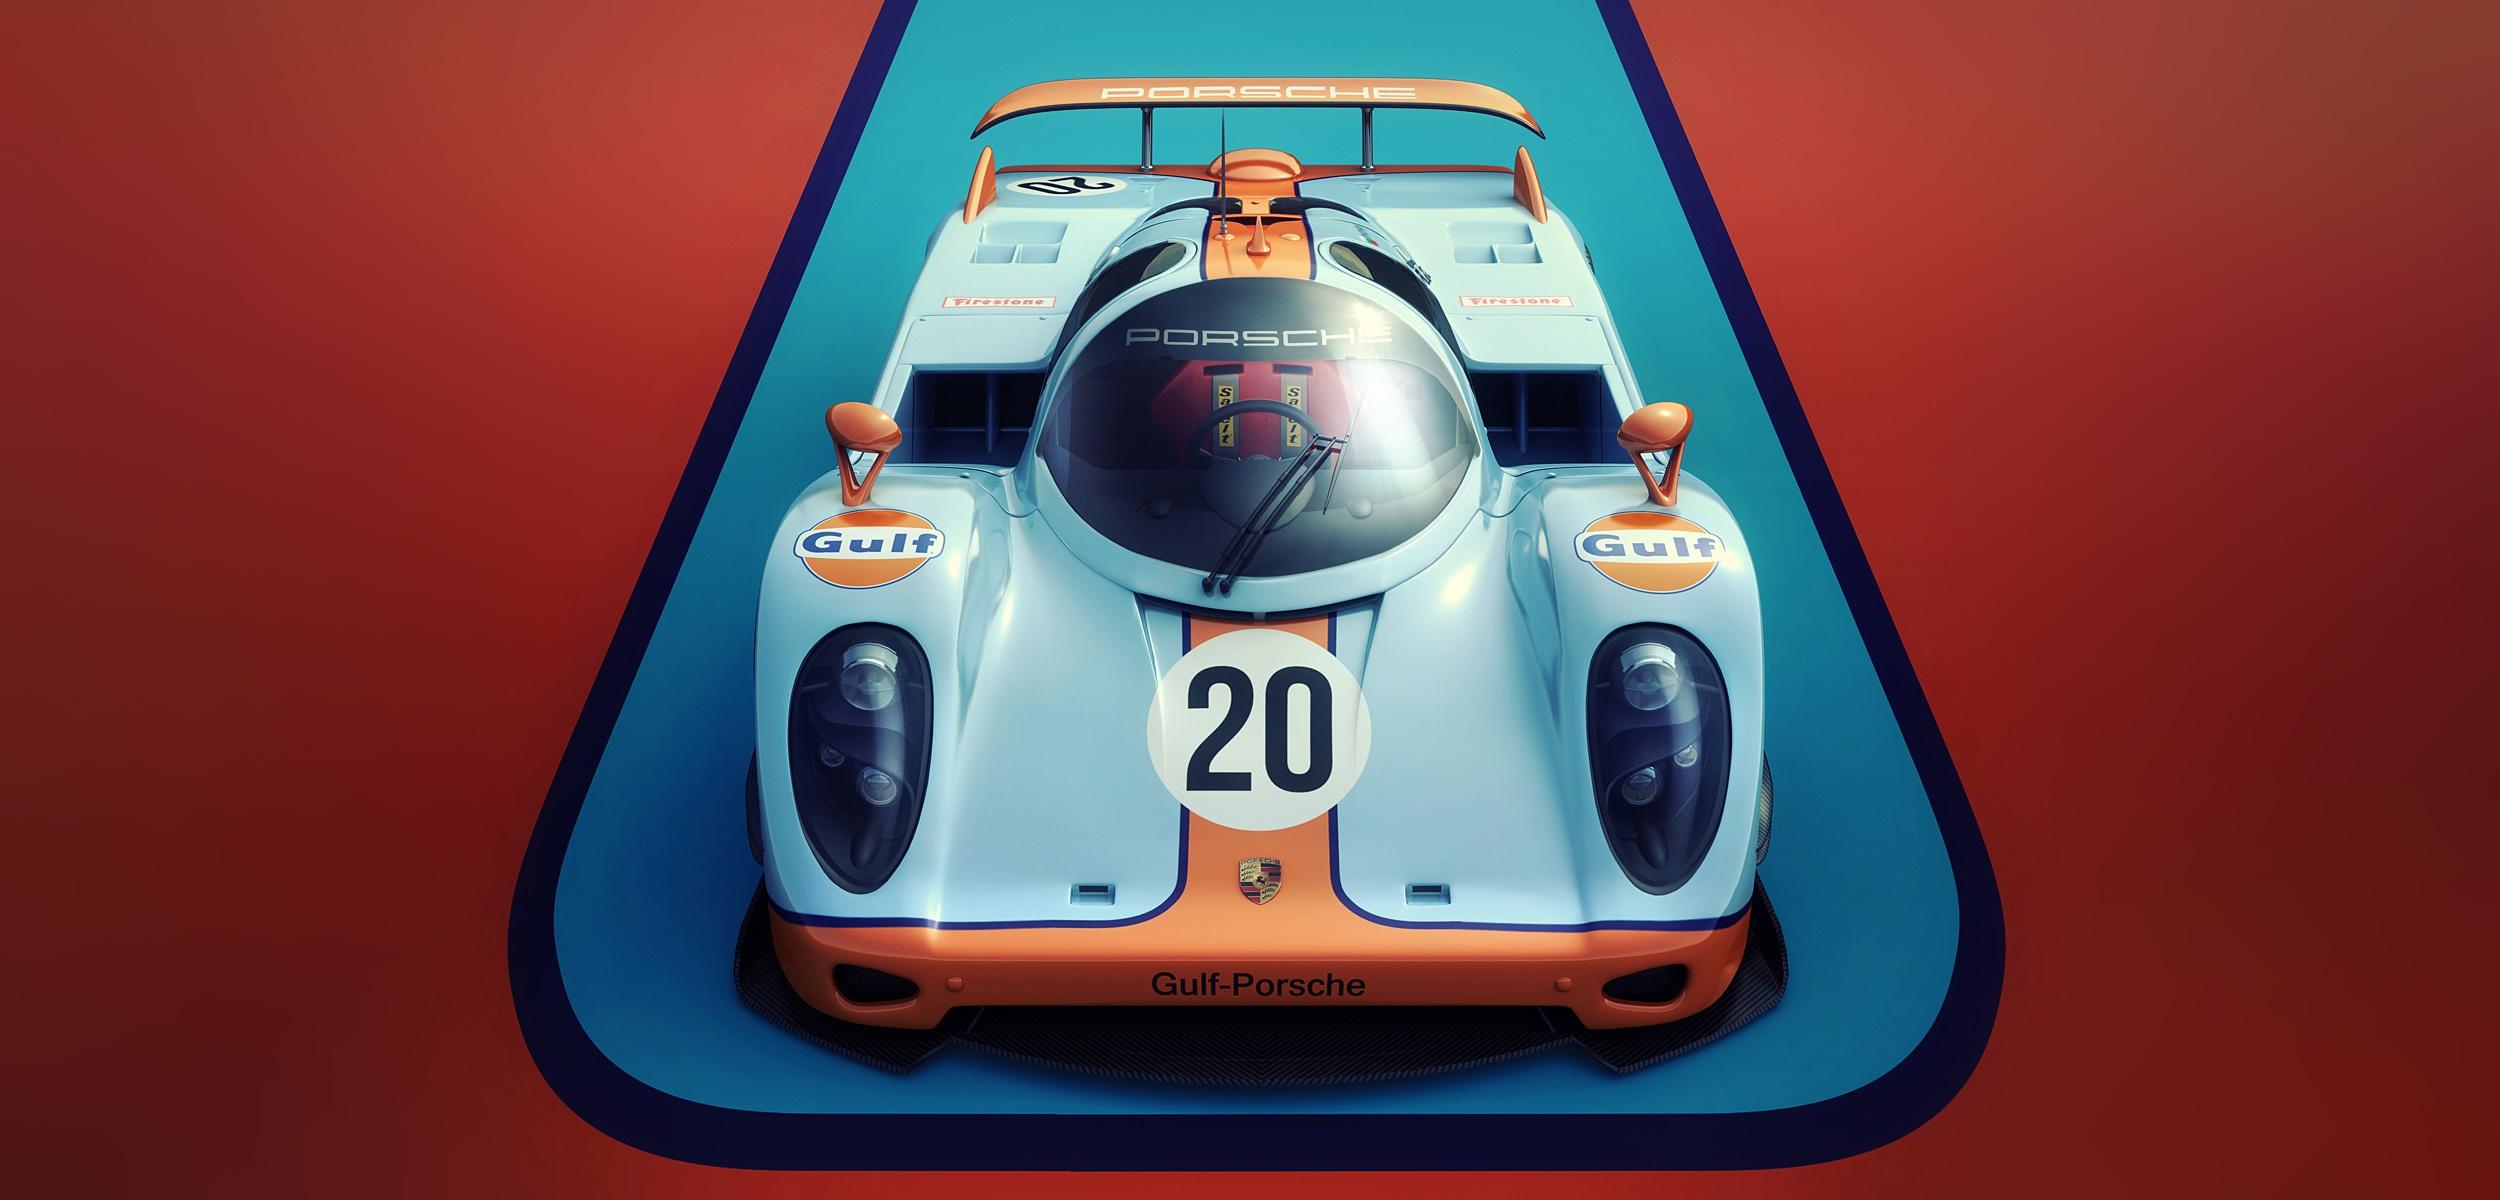 General 2500x1200 car vehicle artwork Porsche 917 Porsche